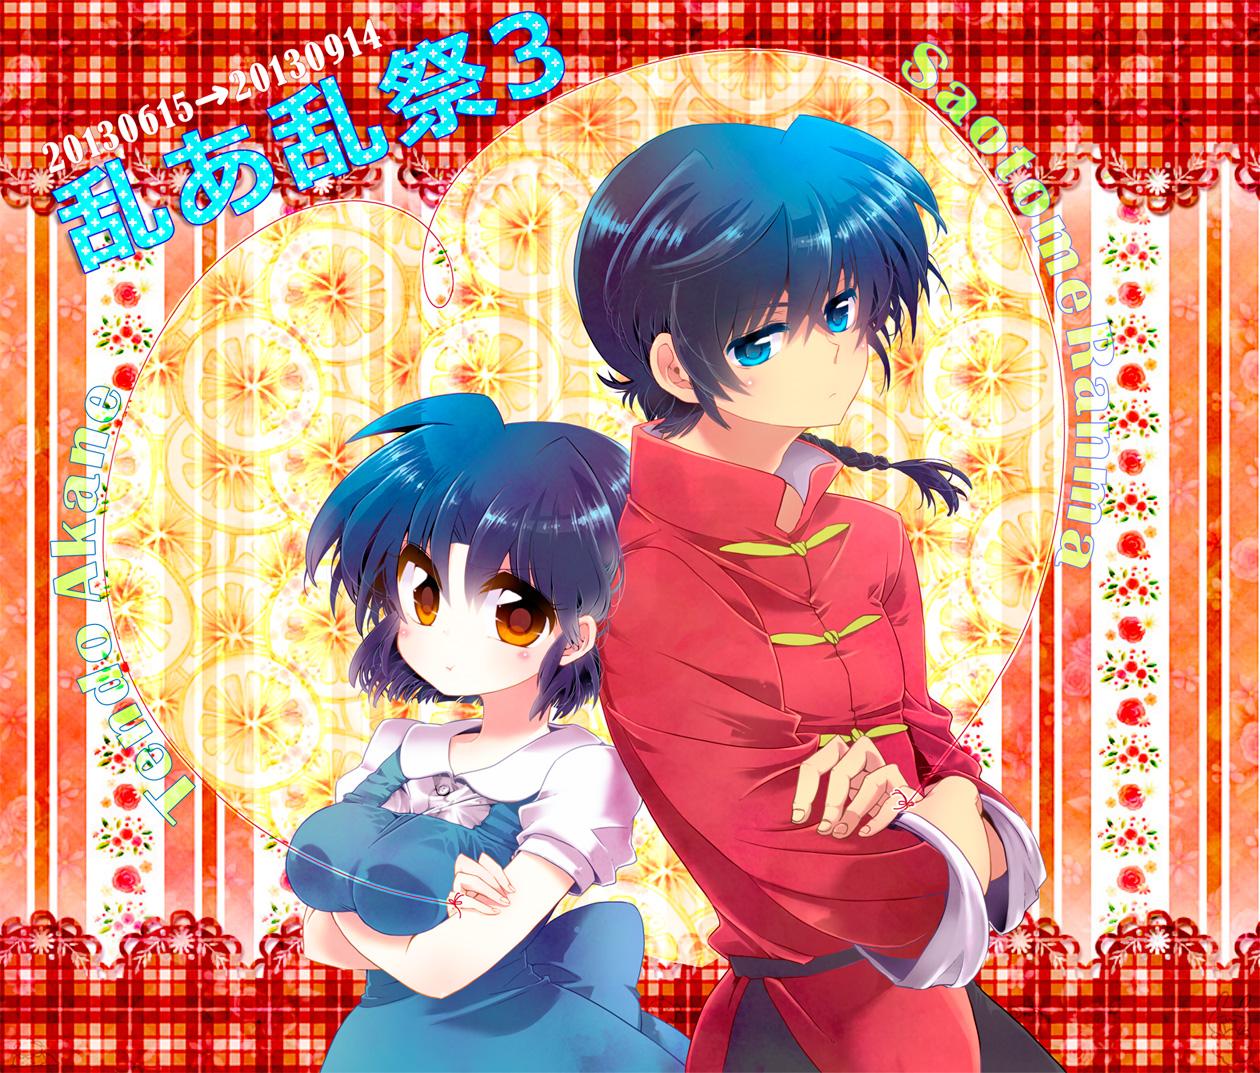 Ranma 1 2 Anime Characters : Ranma ½ takahashi rumiko image zerochan